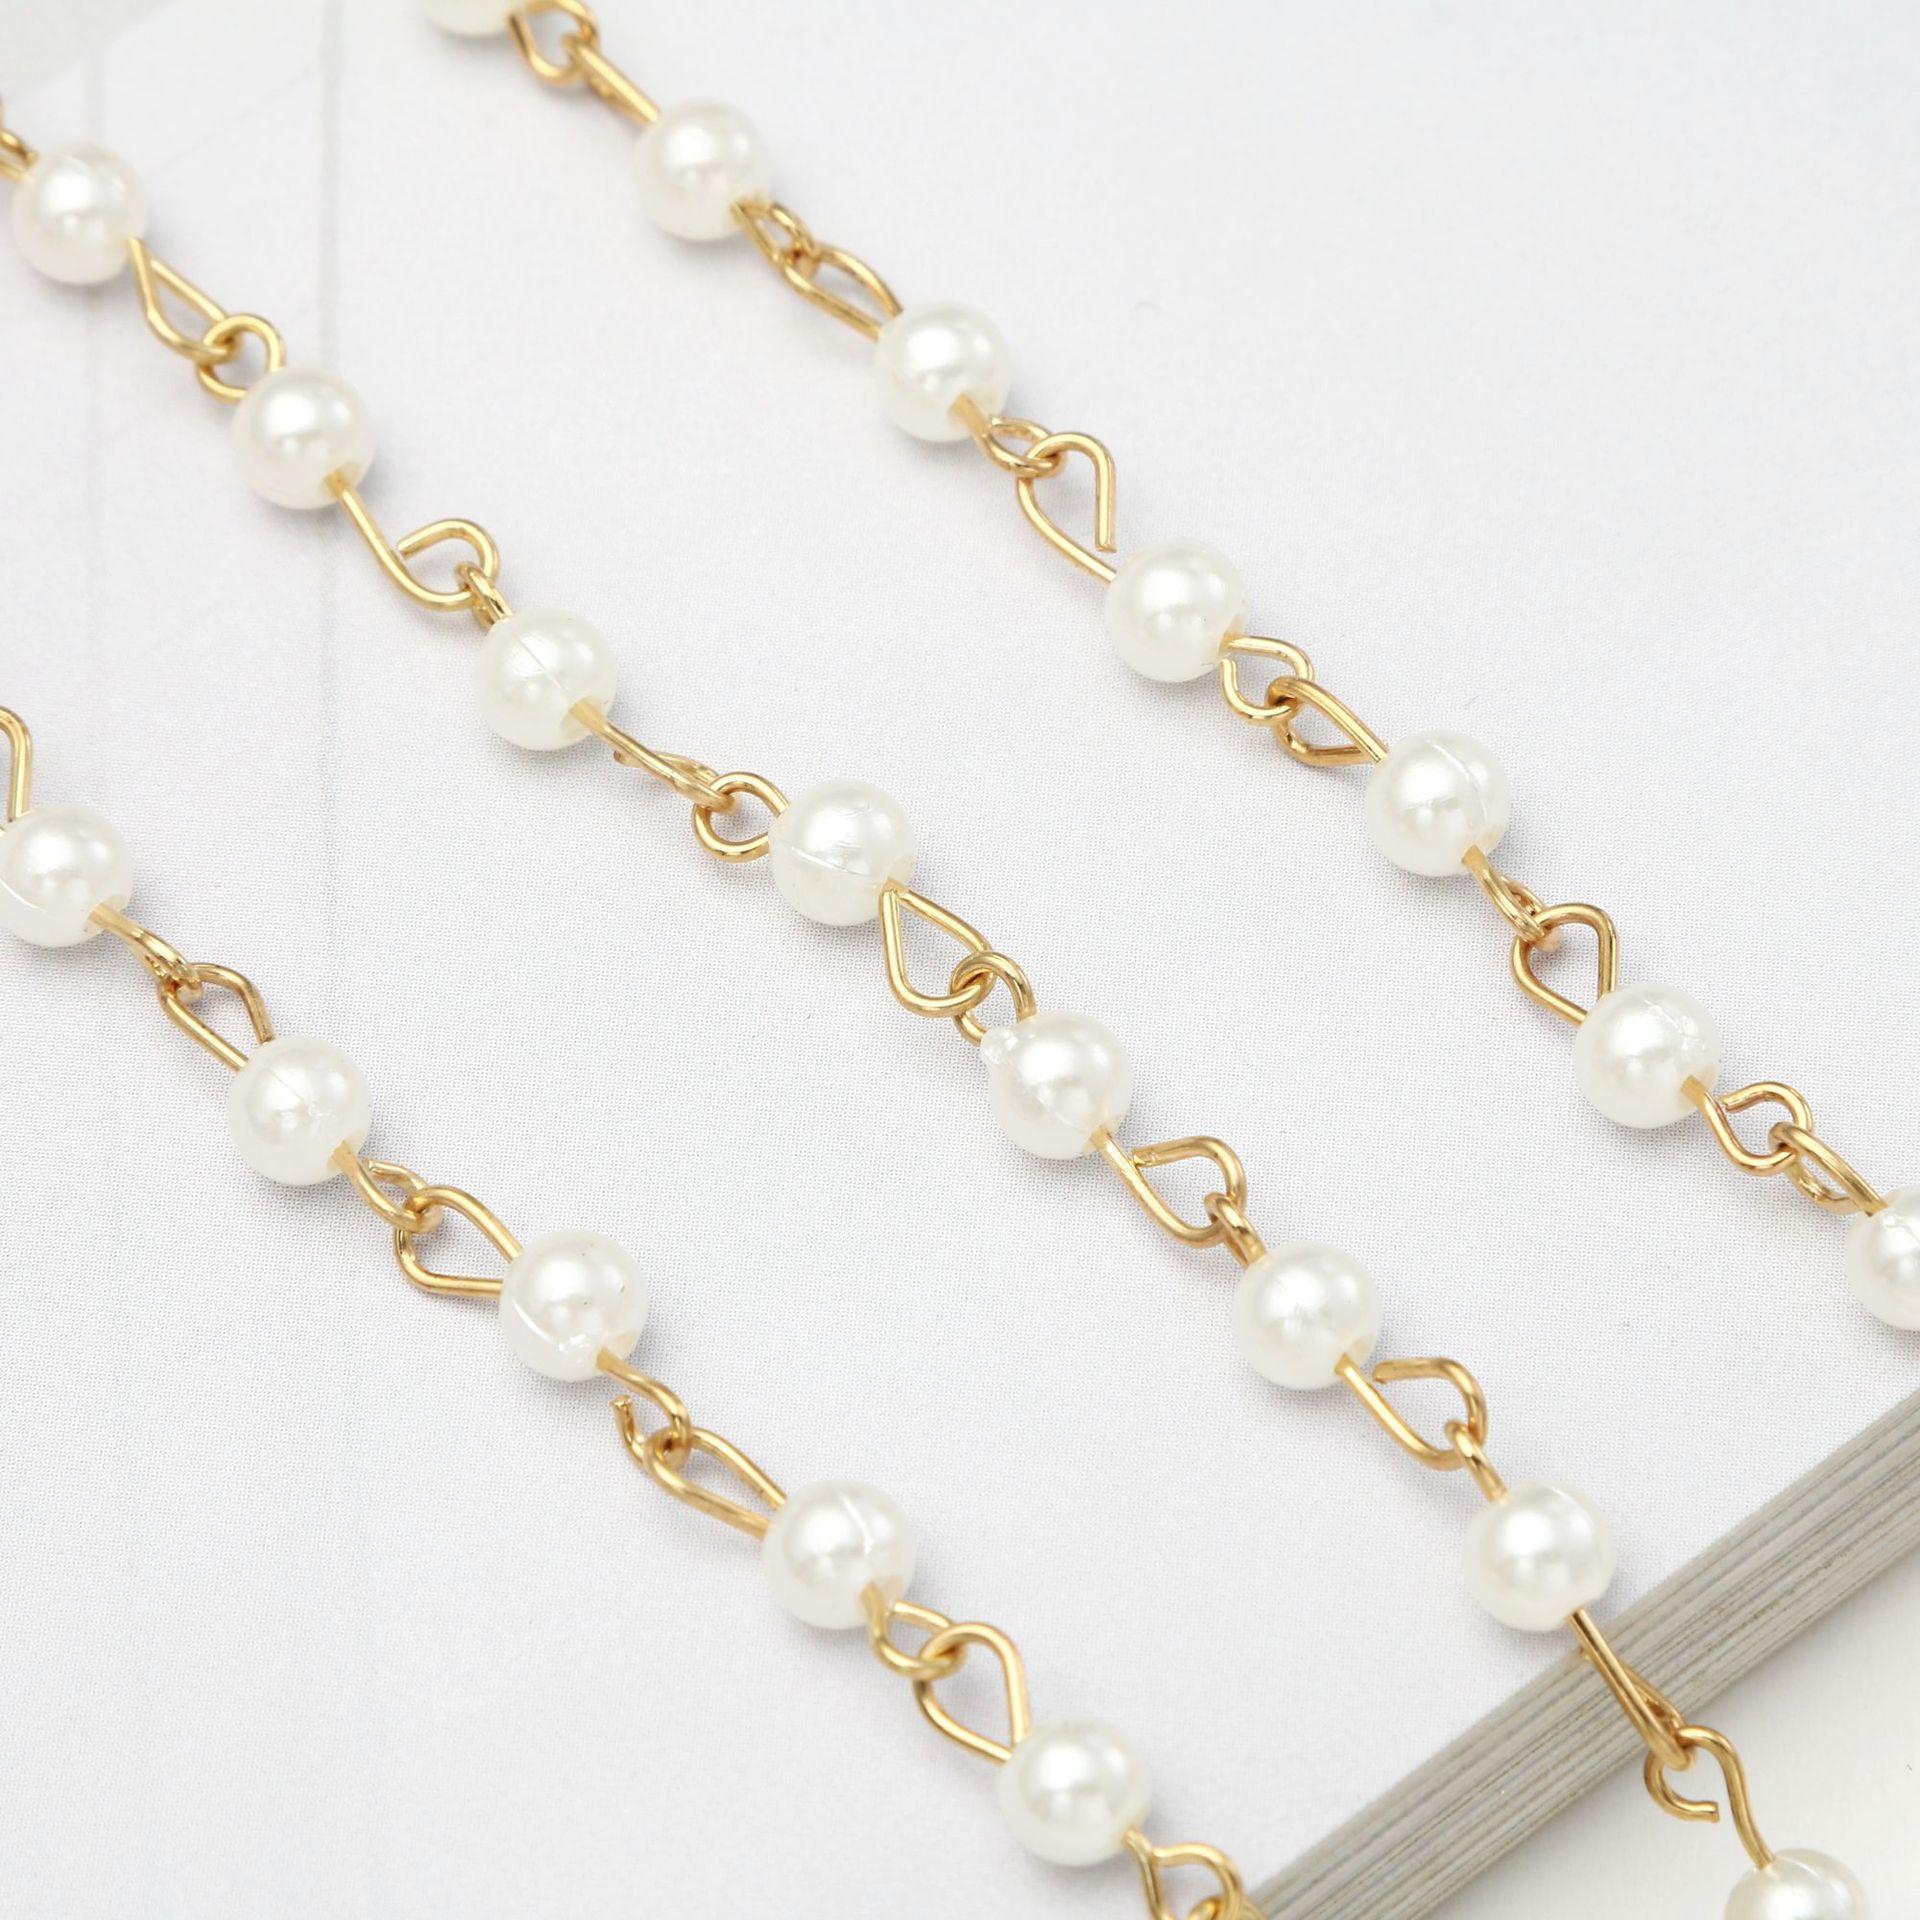 Fashion Women Simulated Pearls Reading Glasses Chain Sunglasses Chain Eyewear Holder Neck Strap Rope Lanyards Boho Necklace